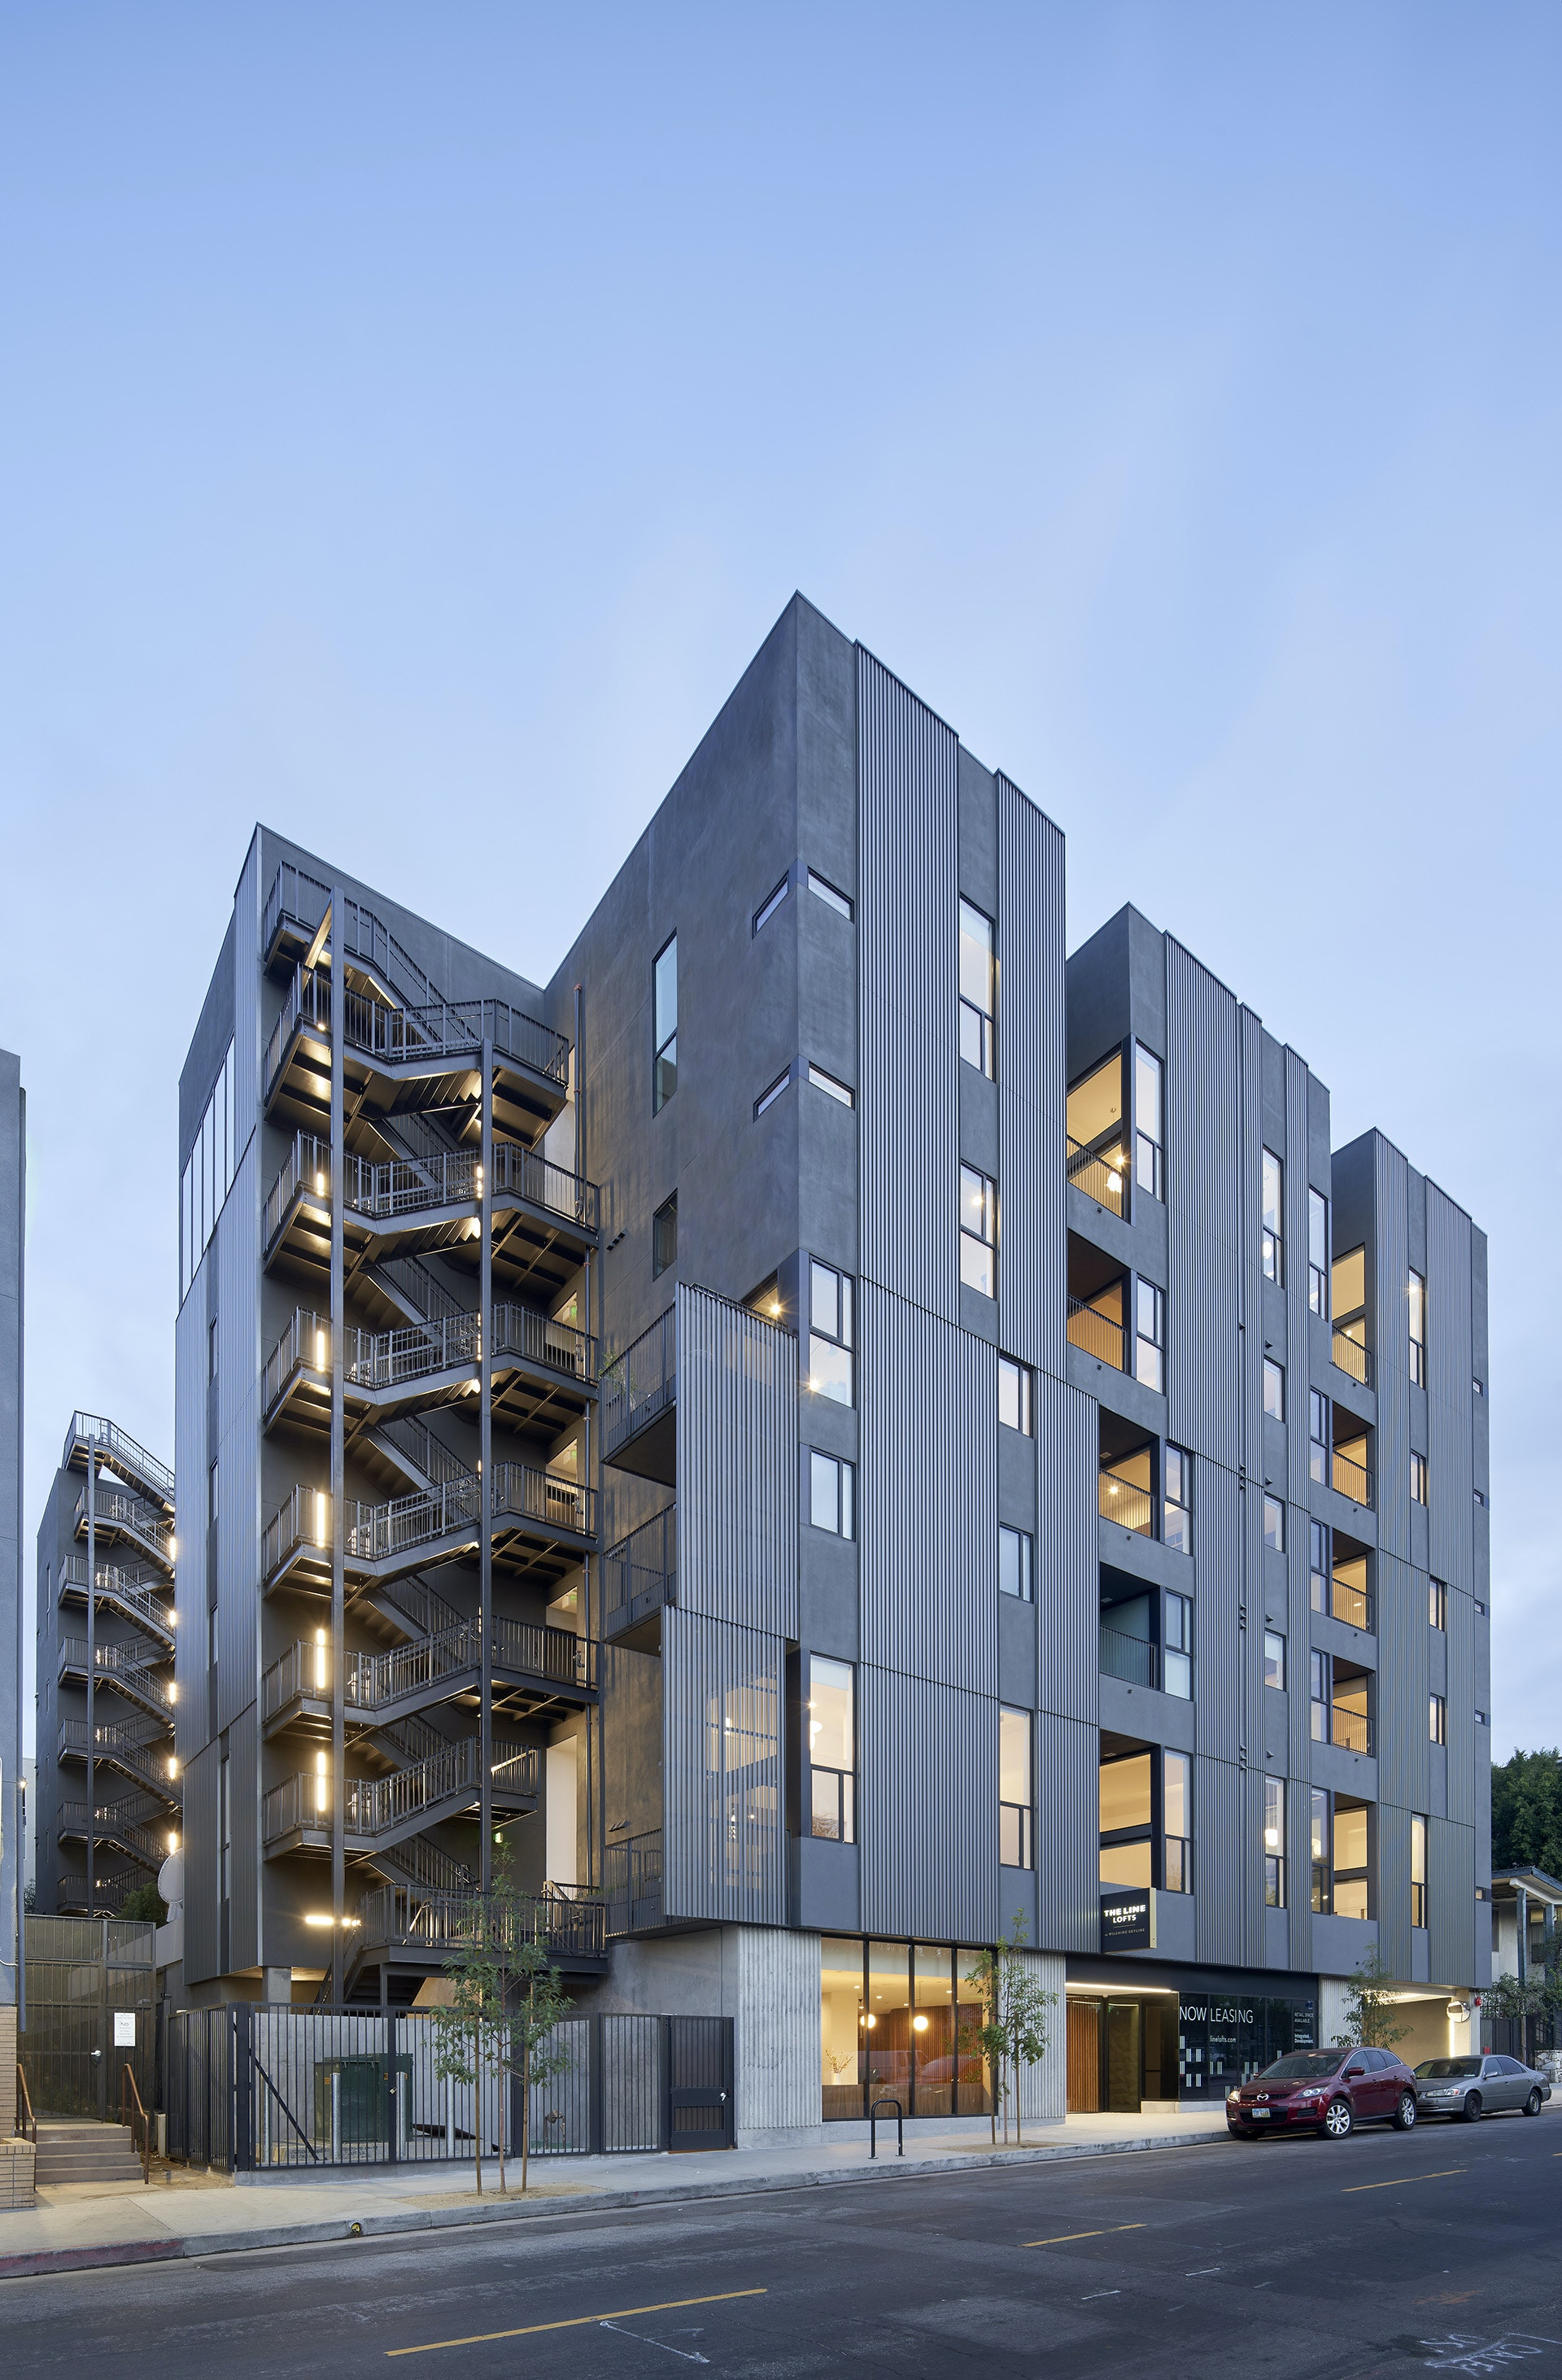 The Line Lofts | SPF:architects